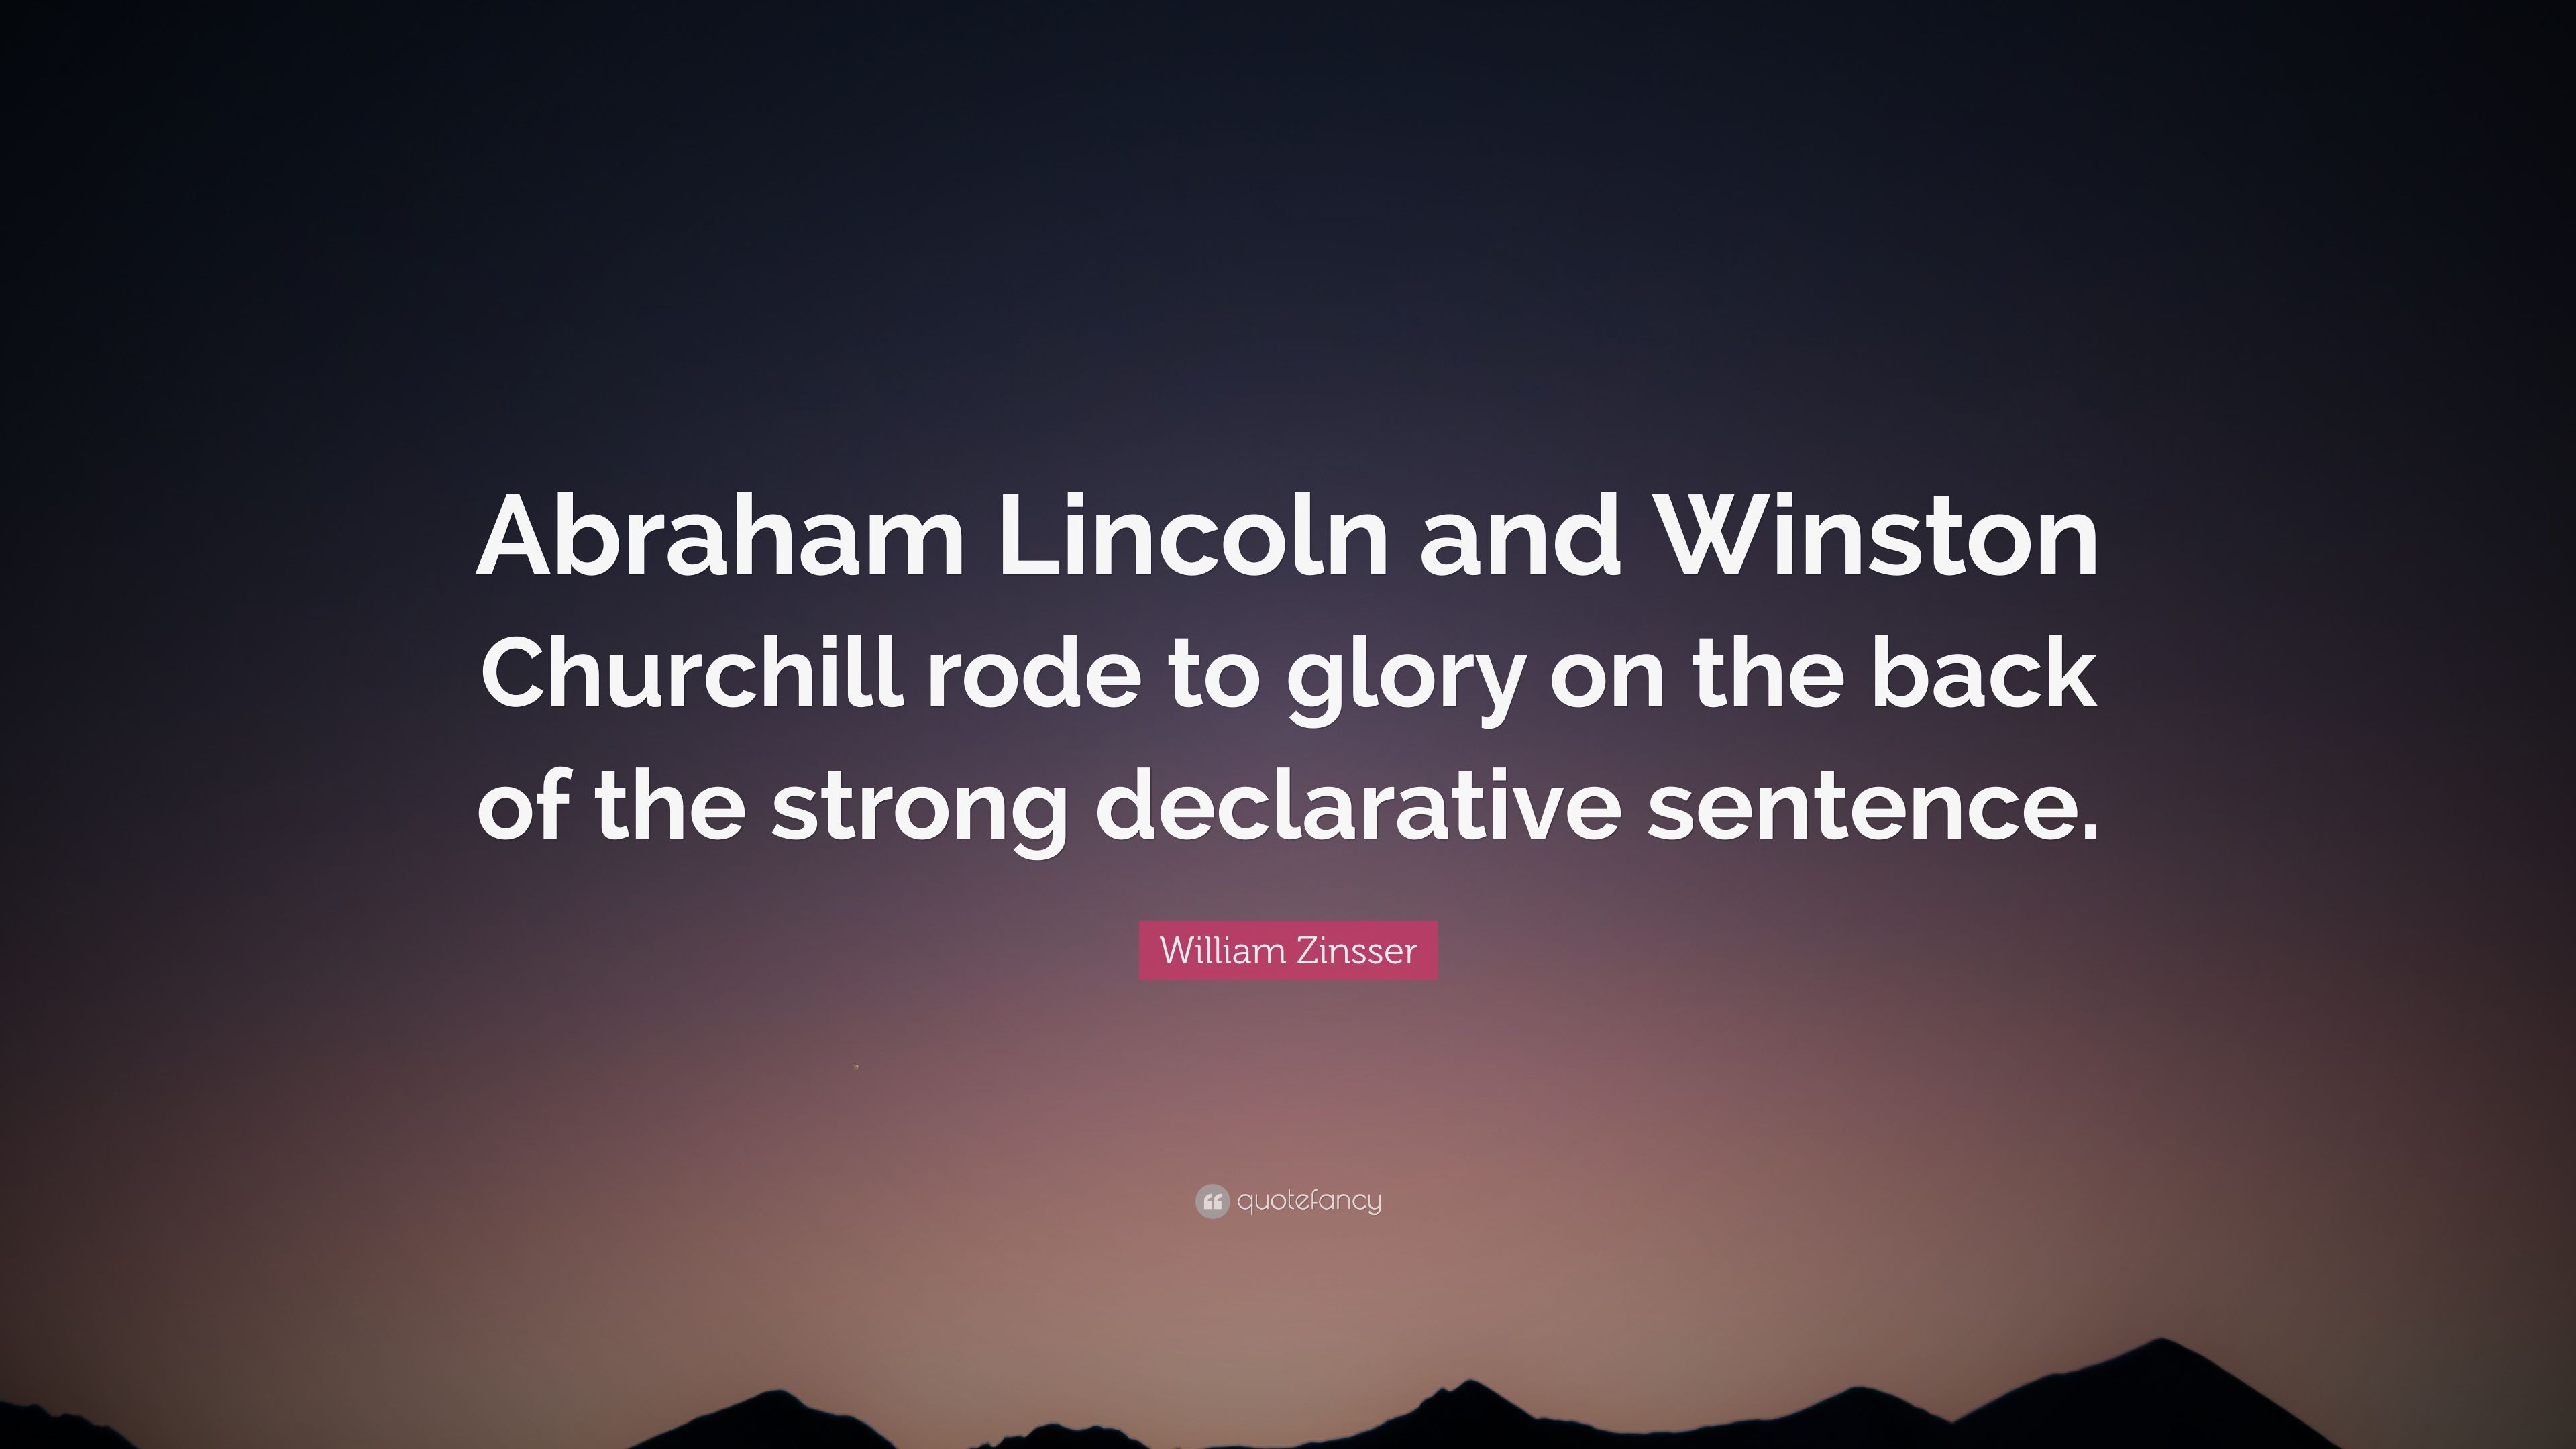 abraham lincoln winston churchill